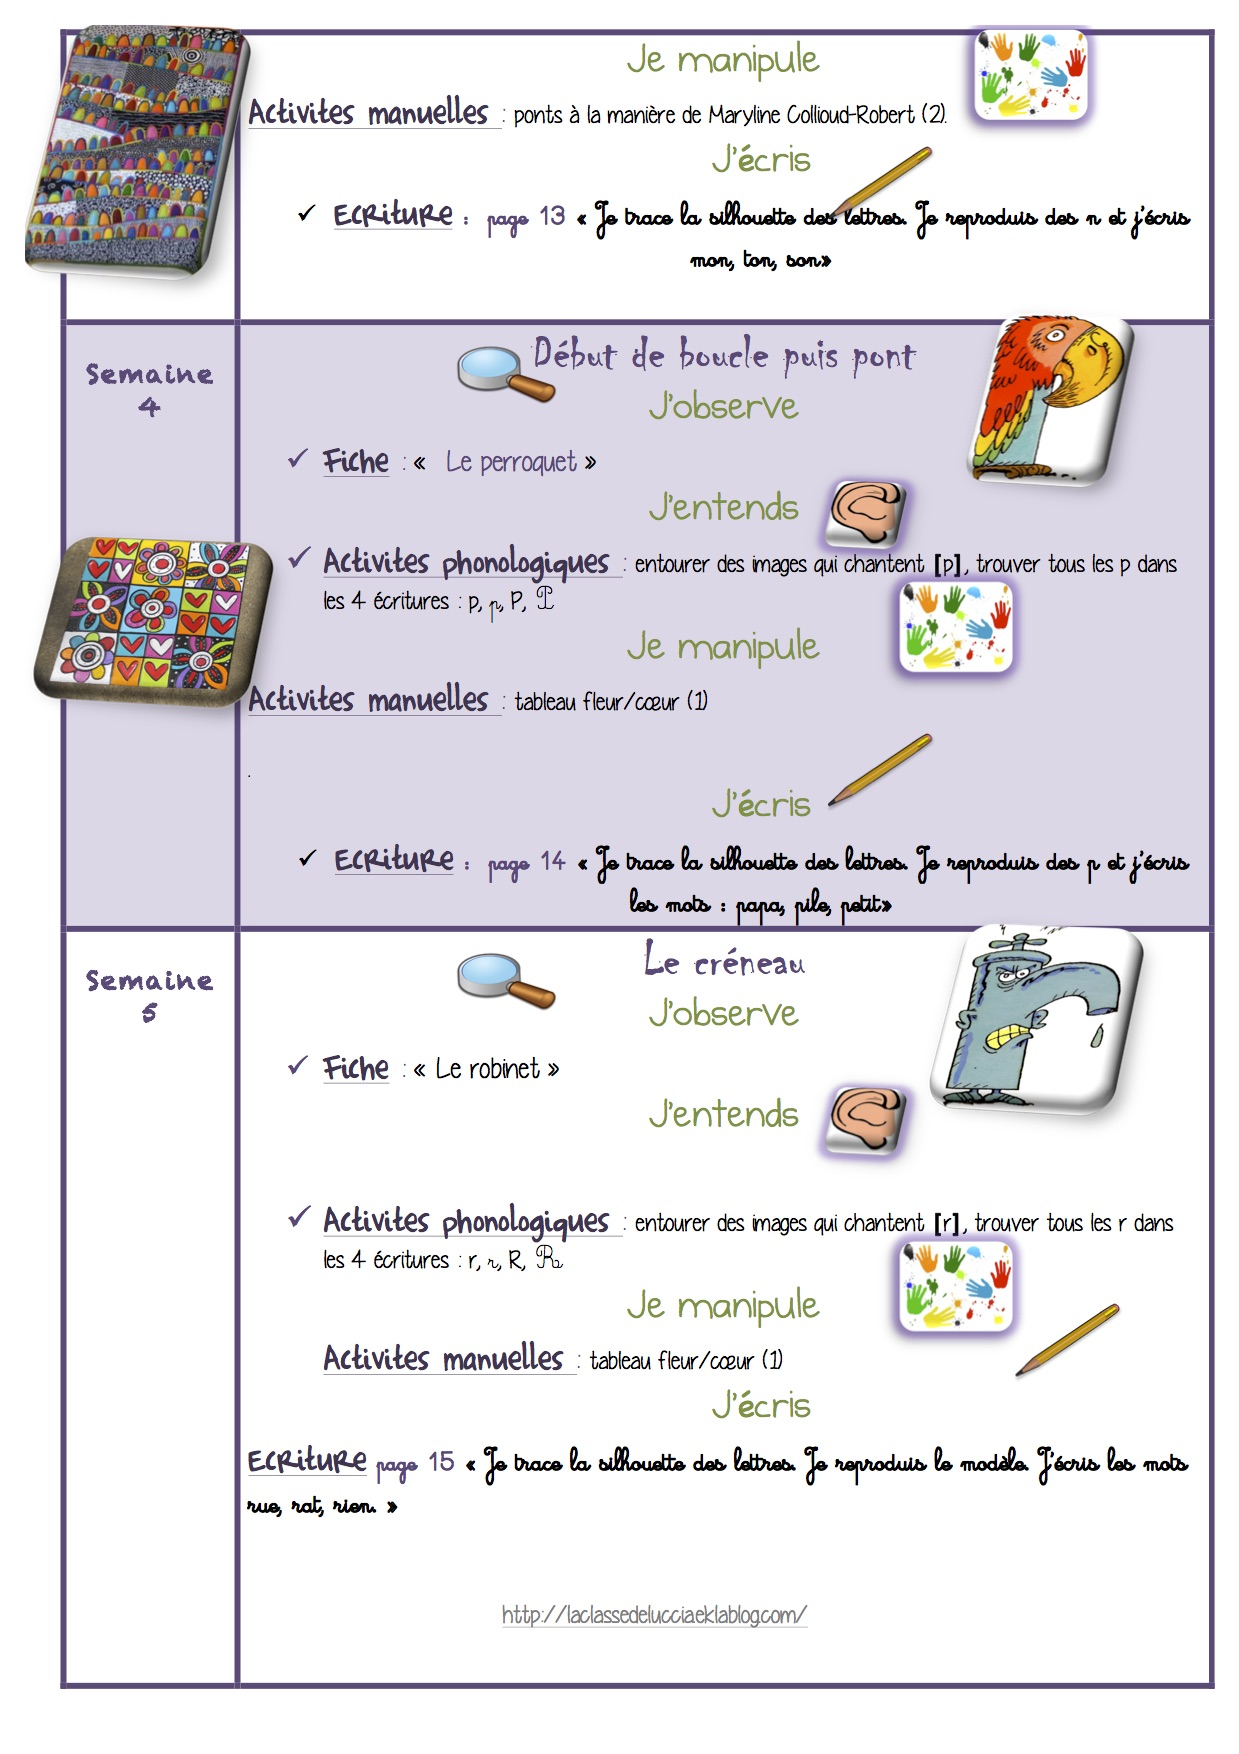 cours complet programmation c pdf